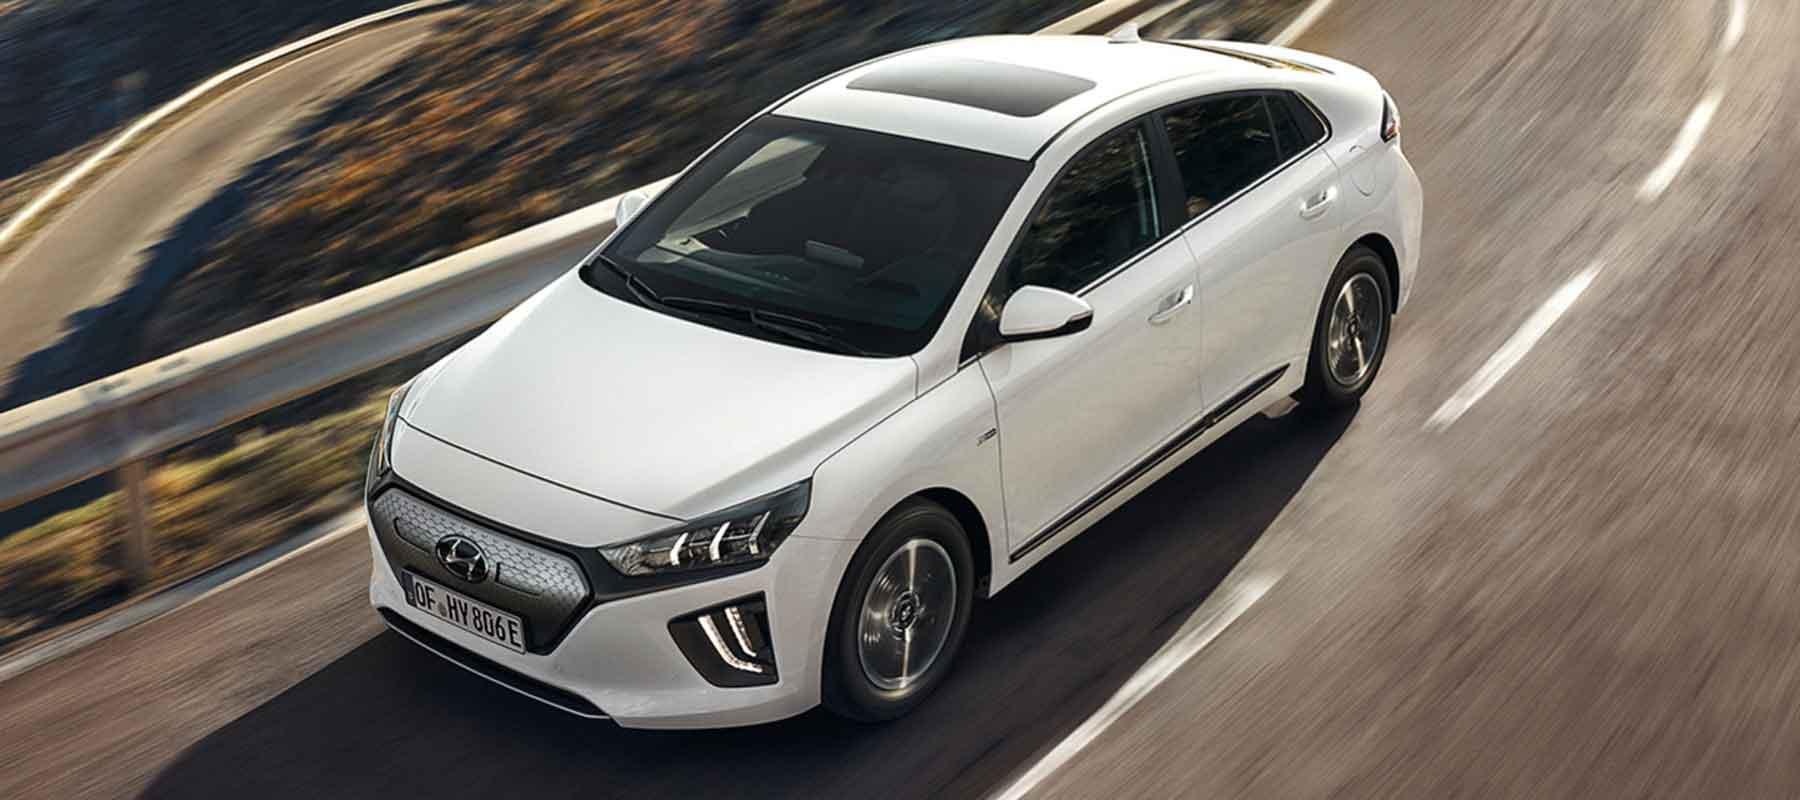 Fahrt mit dem Hyundai Abo ab 18.